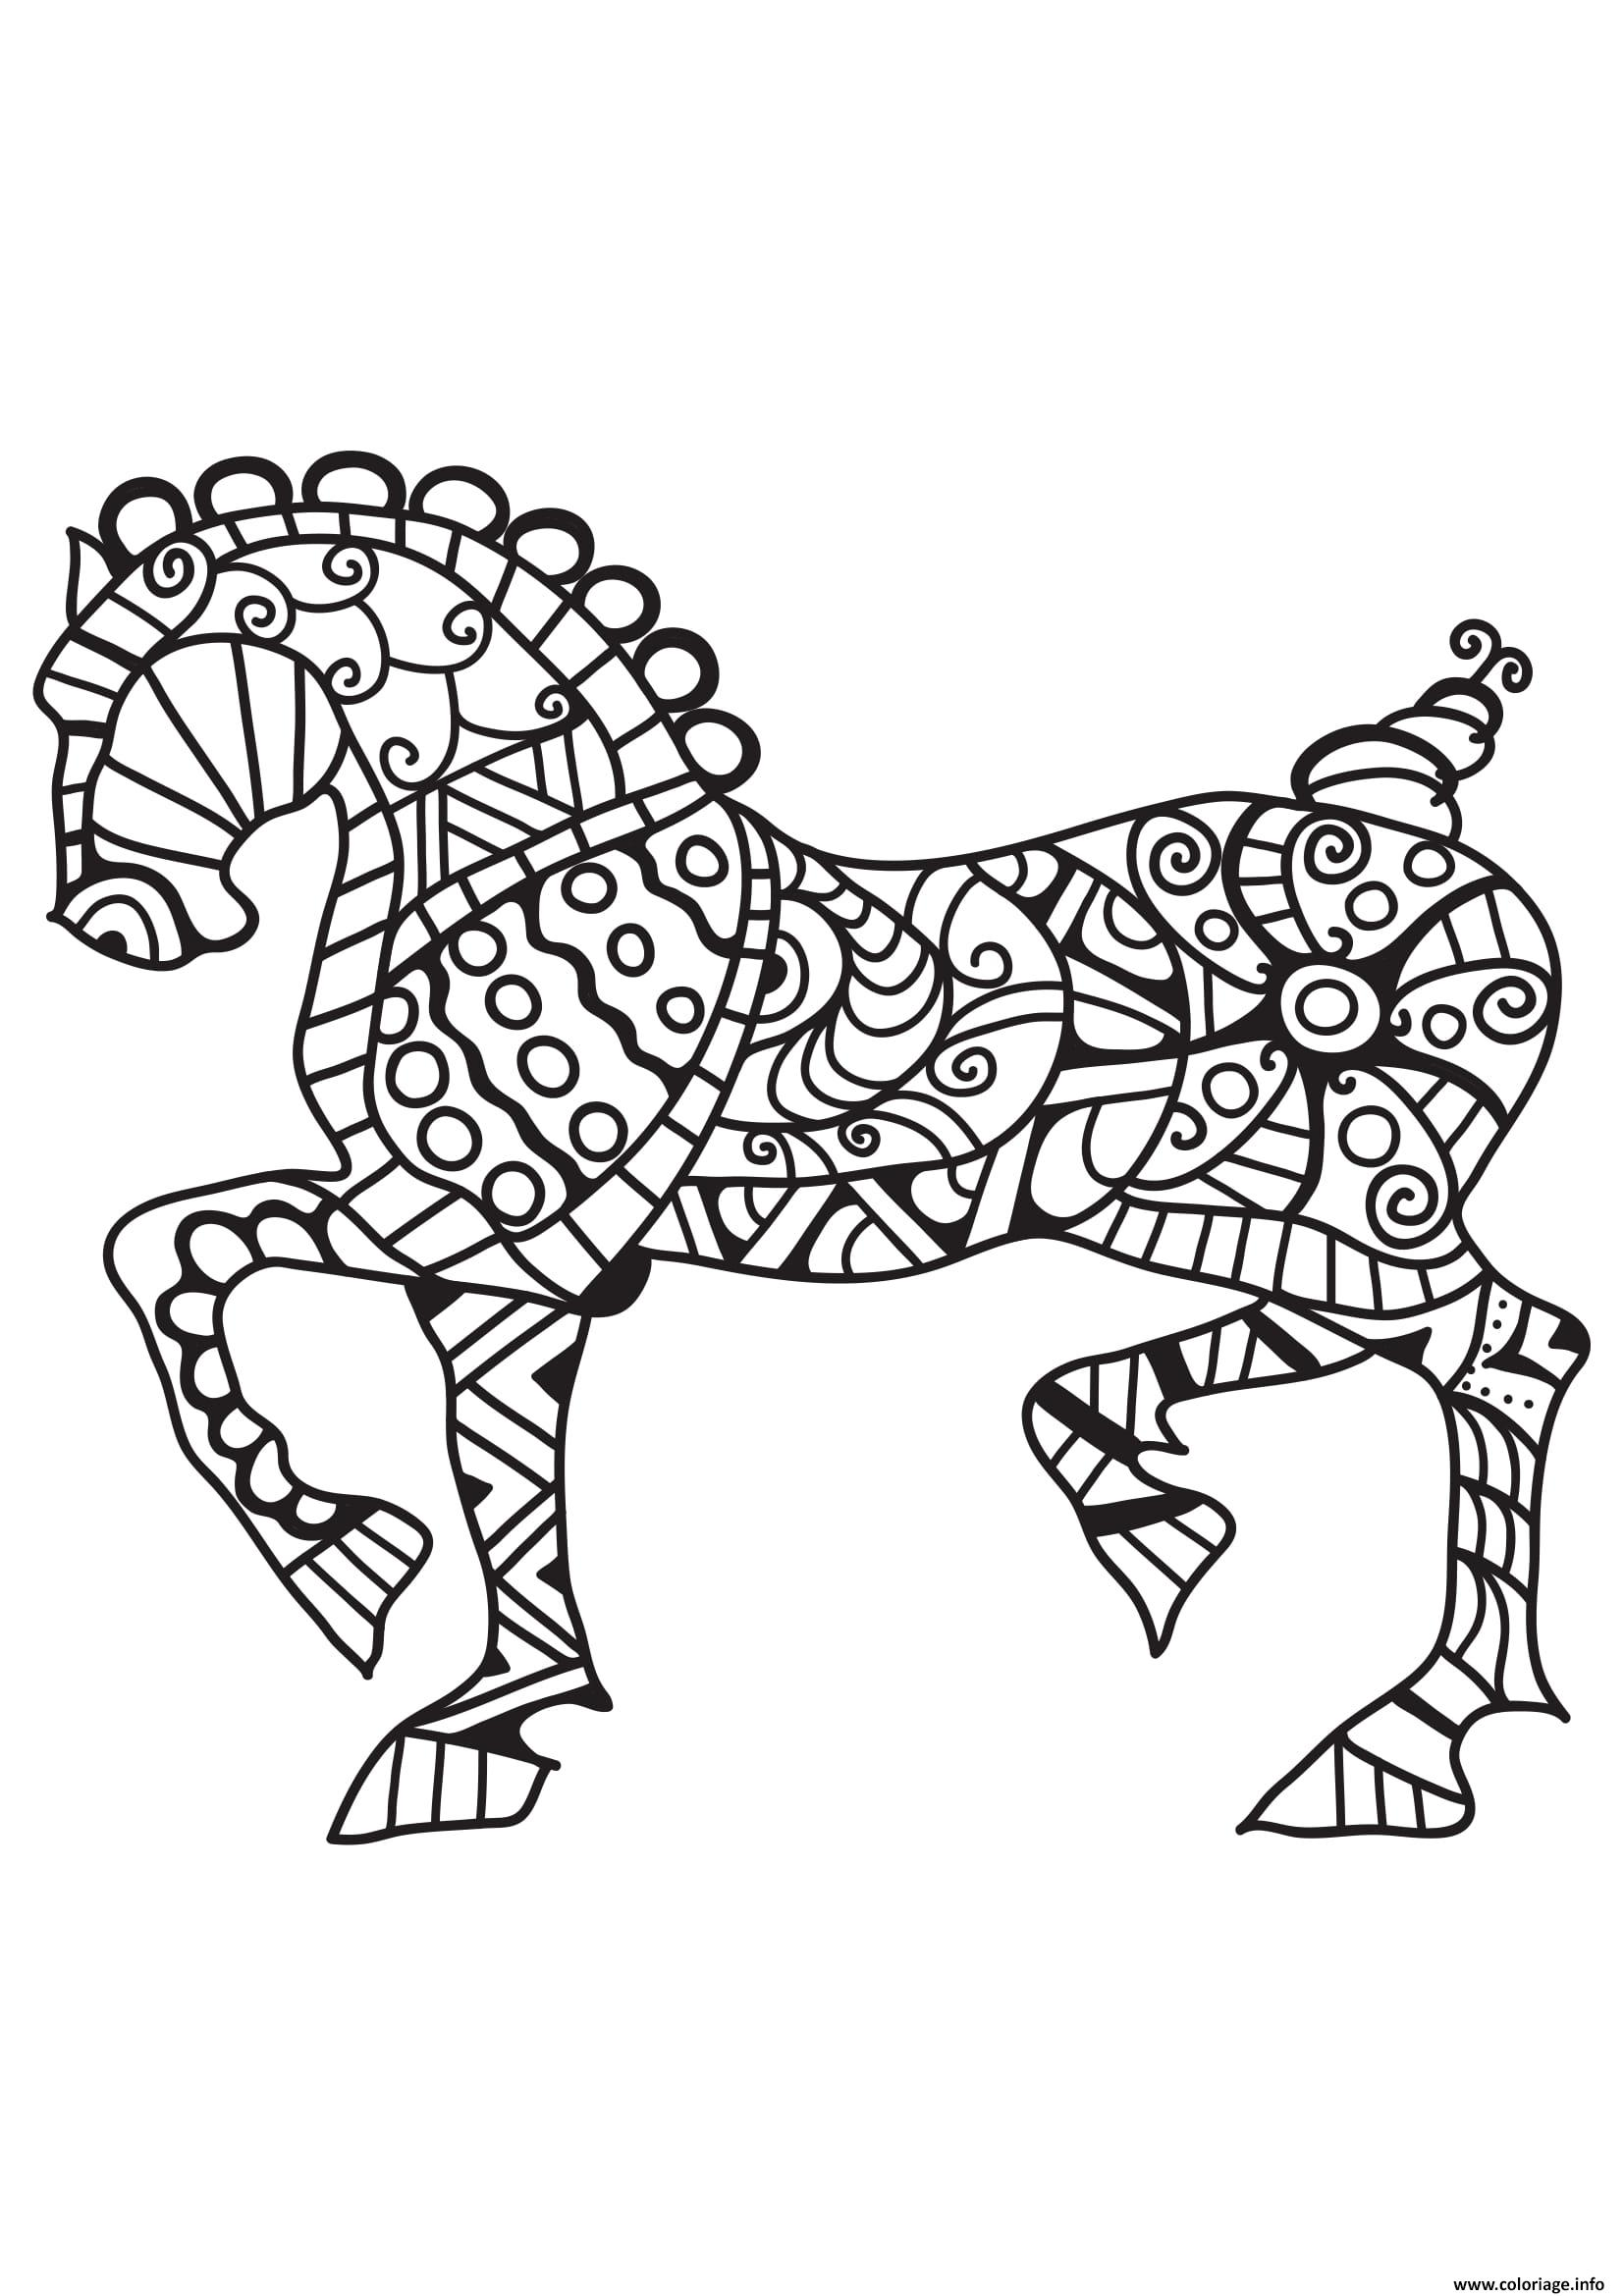 Coloriage adulte cheval mandala - Mandala de chevaux ...